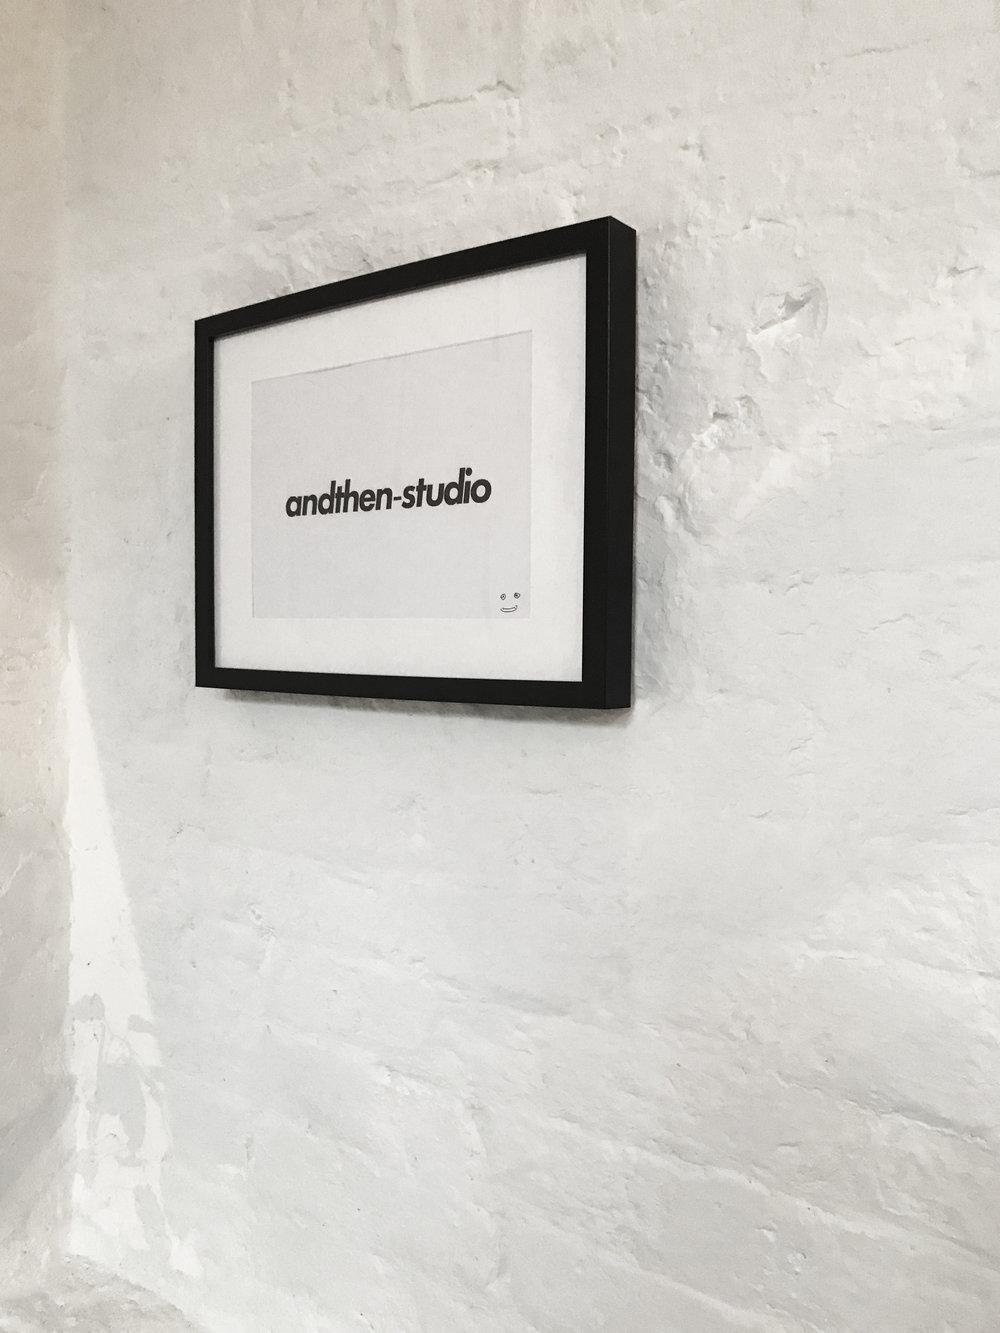 andthen-studio logo